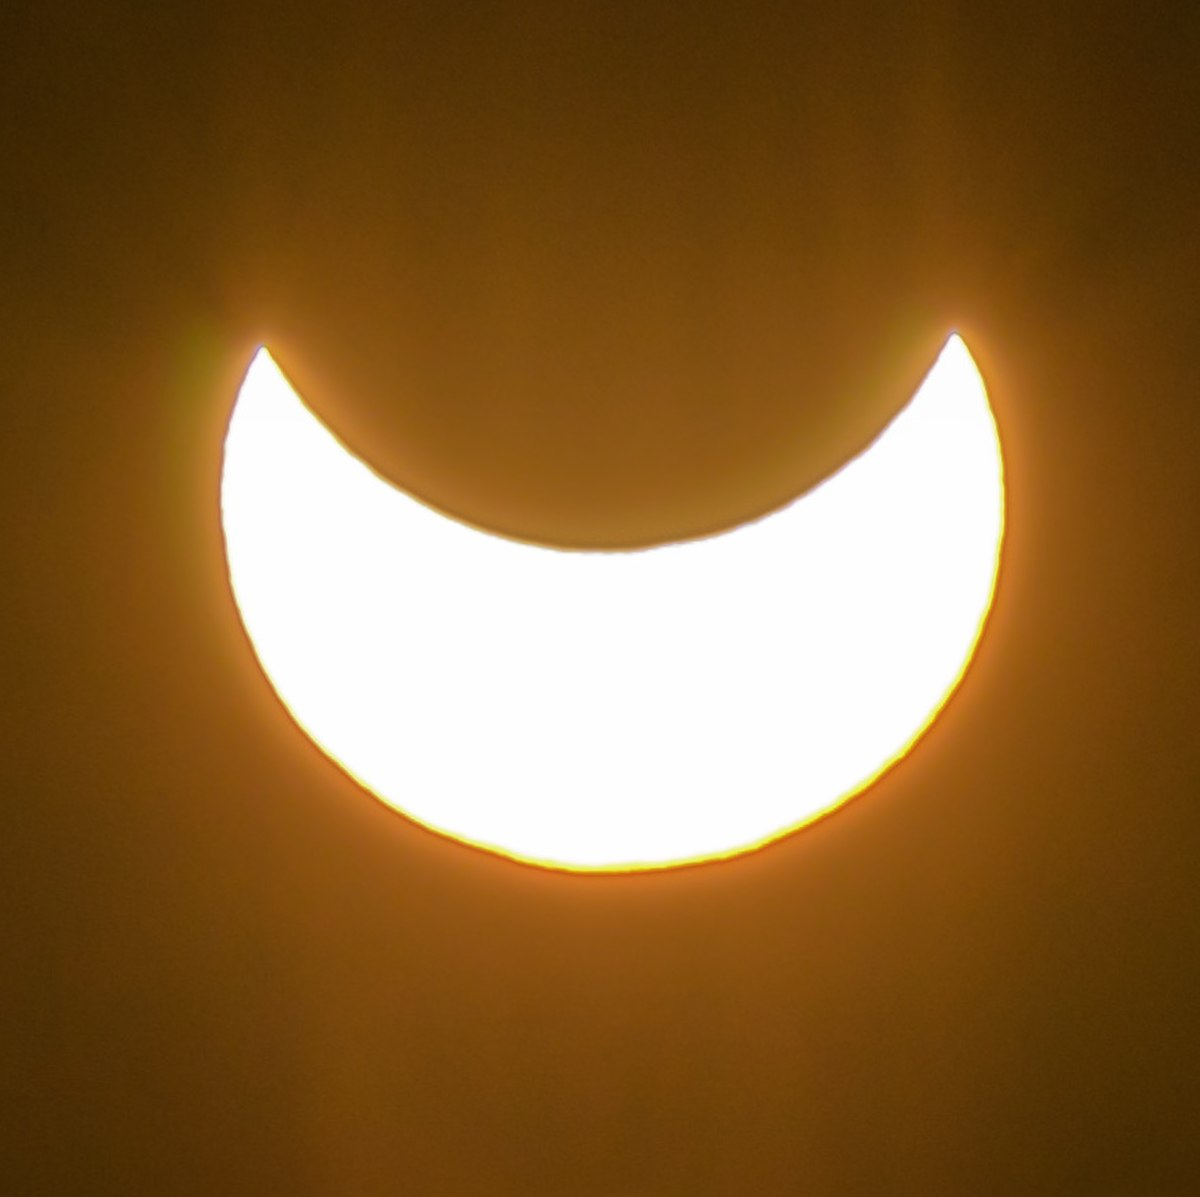 Solar Eclipse Visiblity Kitchener Ontario